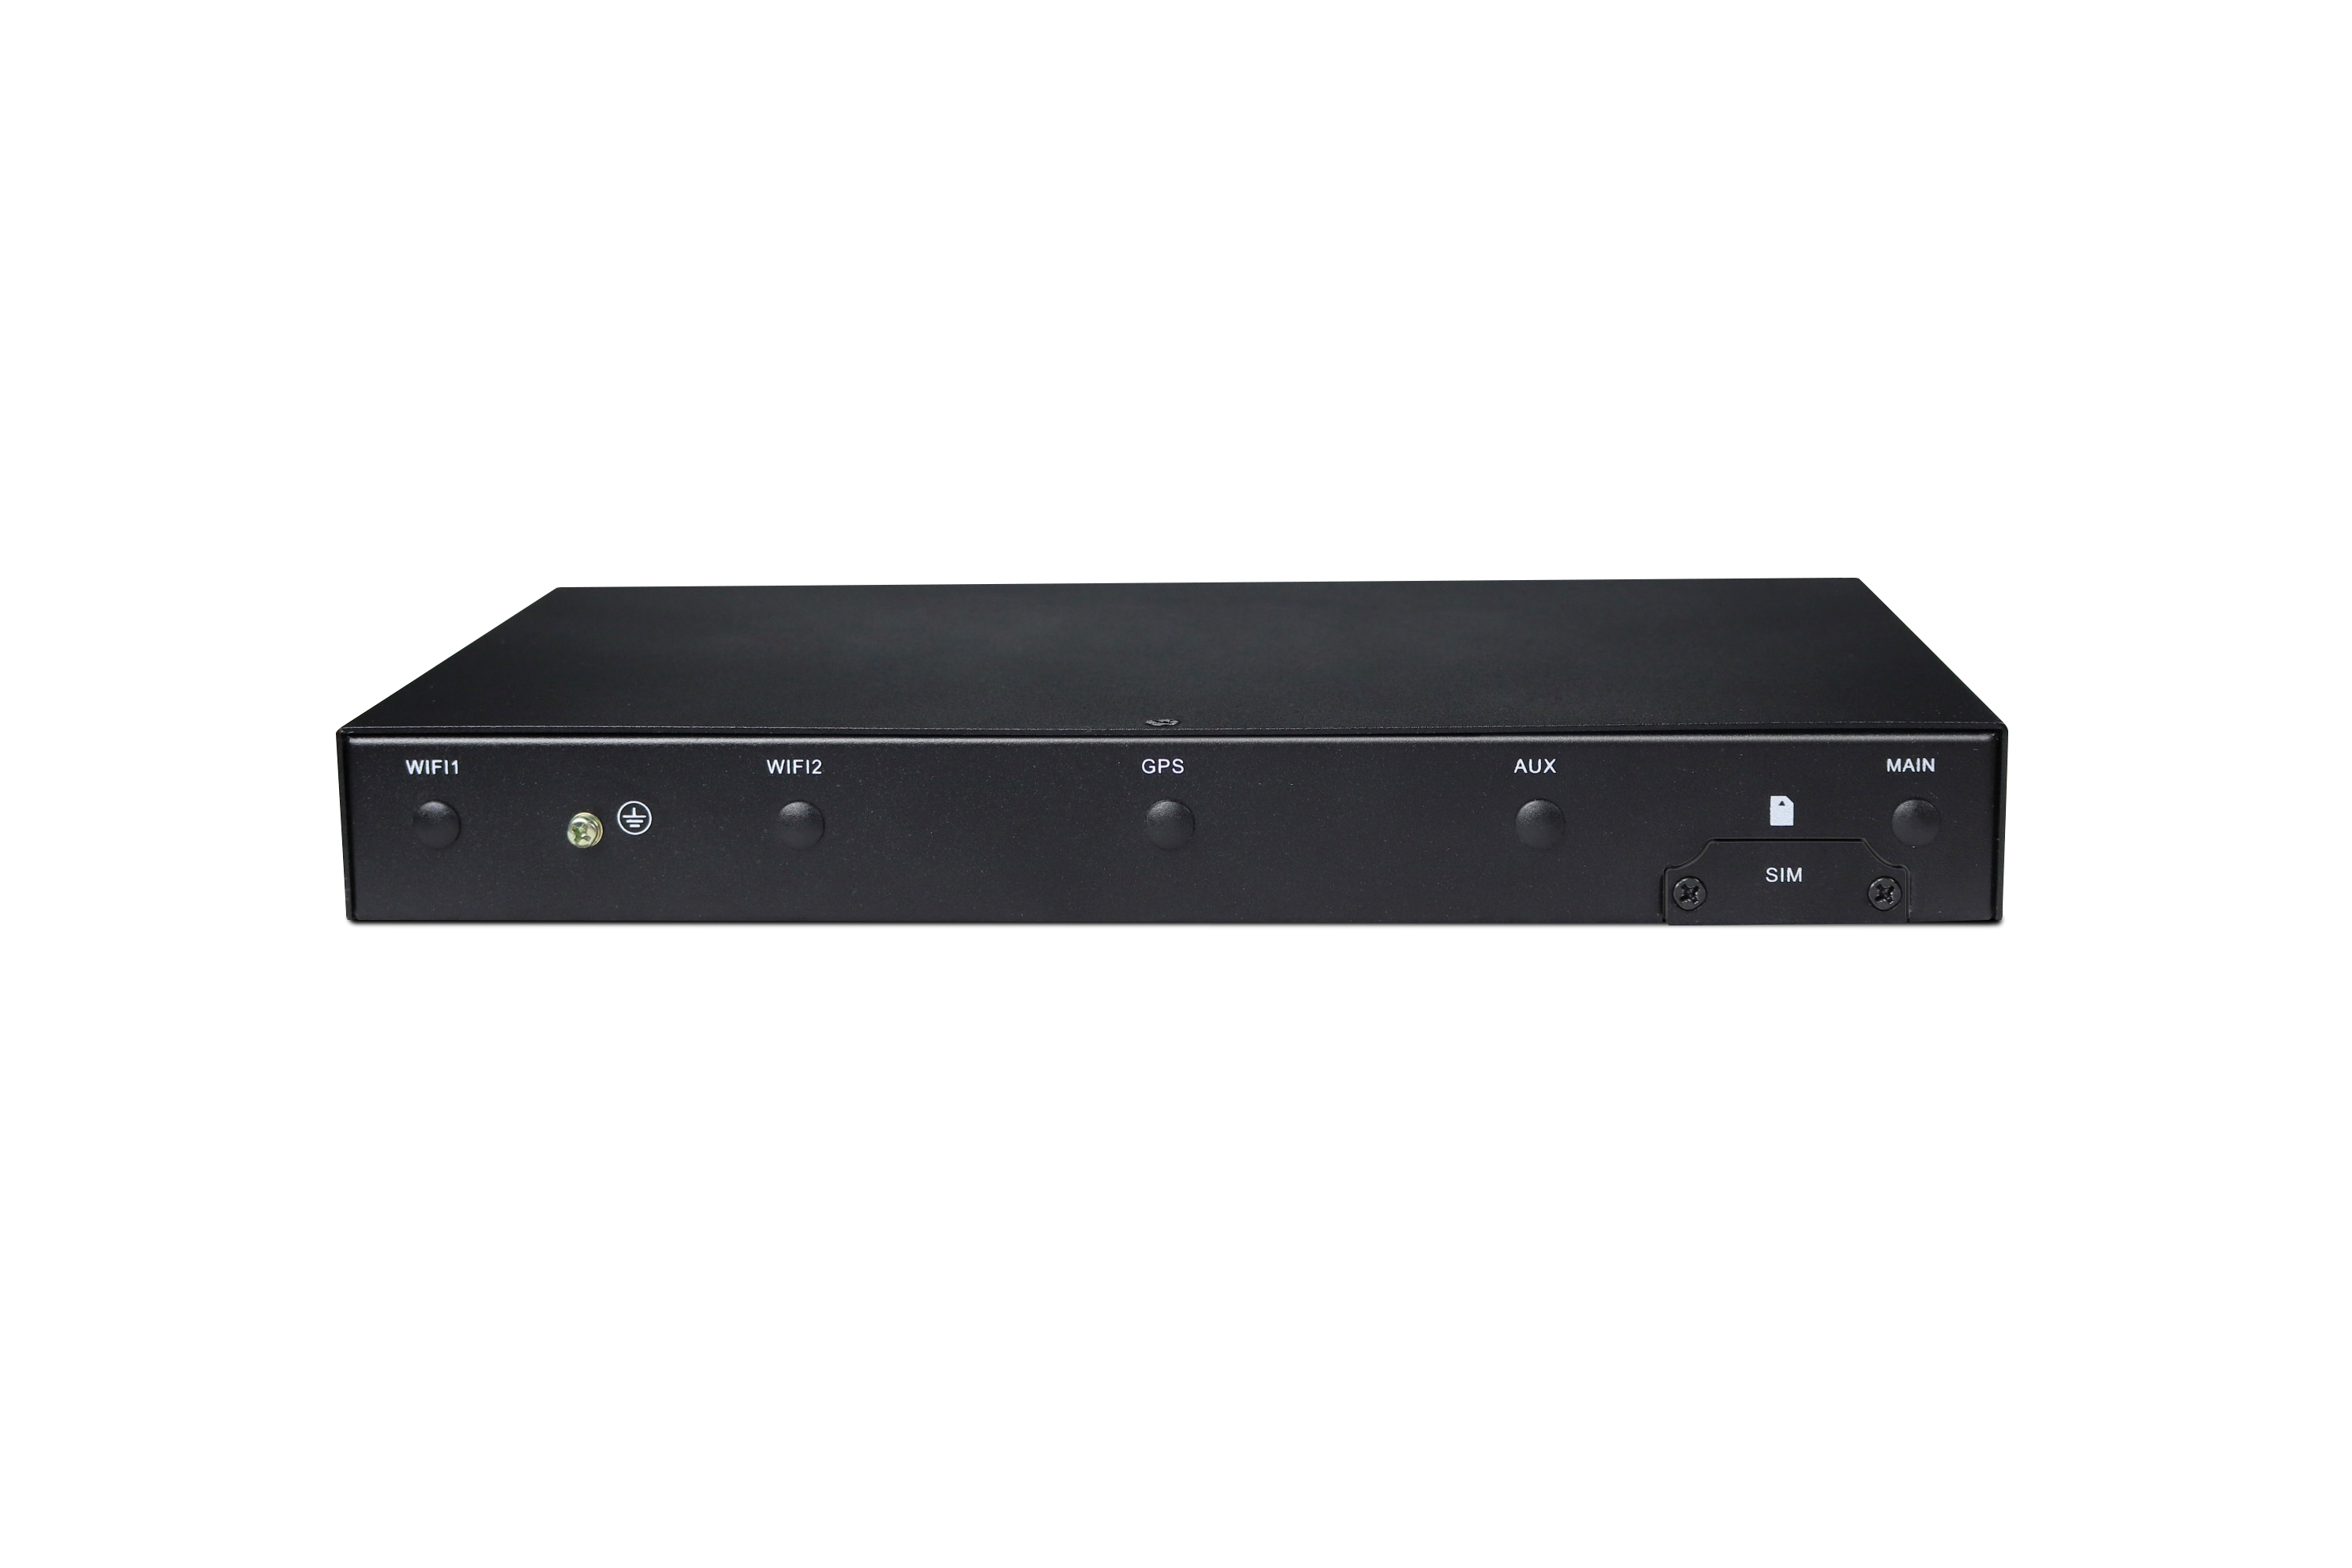 R4A00 Wavetel Dual SFP Load Balance Router Back